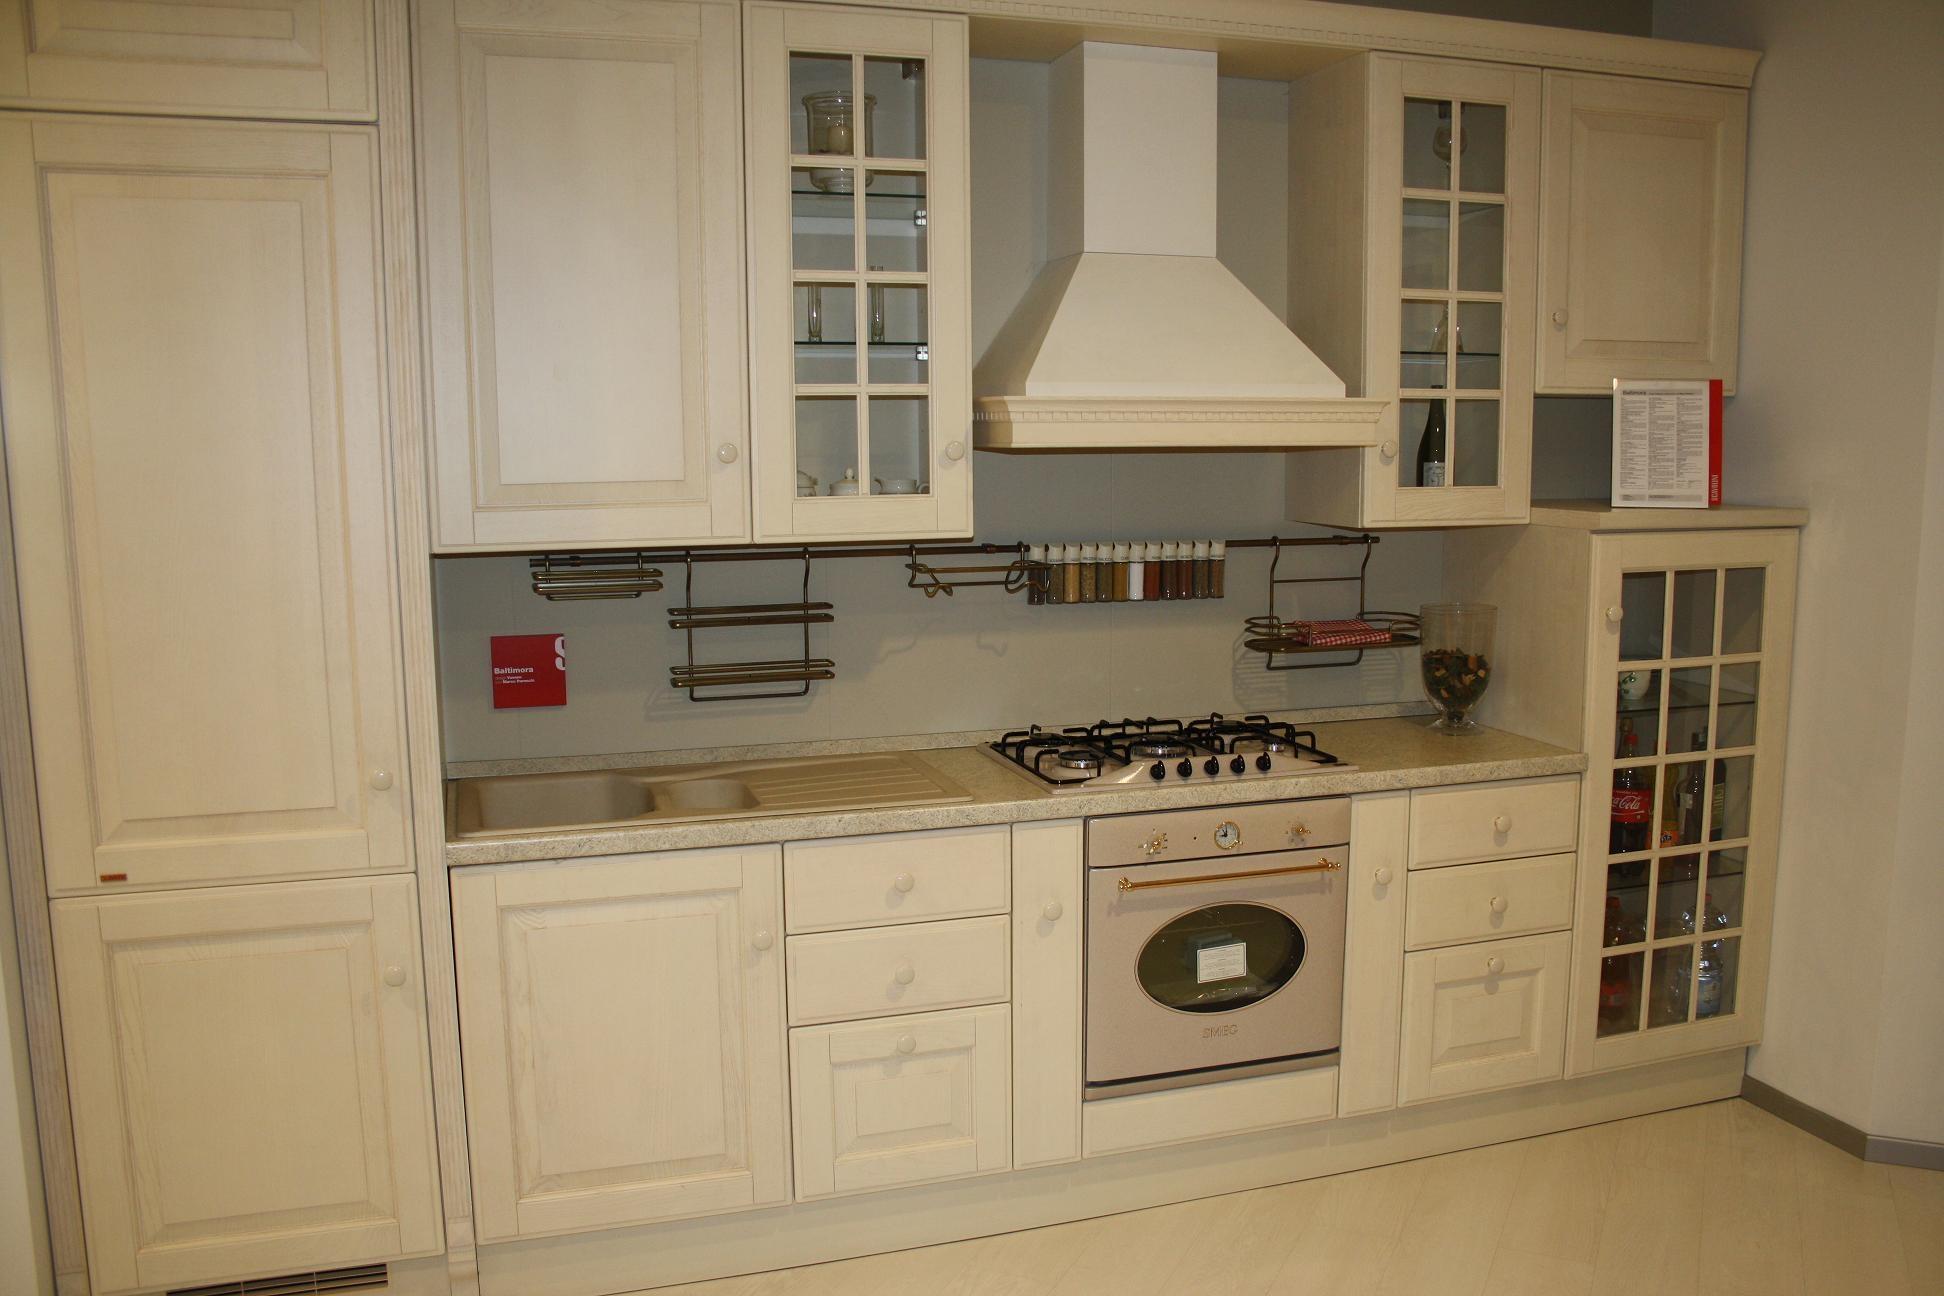 Cucina scavolini mod baltimora cucine a prezzi scontati - Cucina scavolini baltimora ...